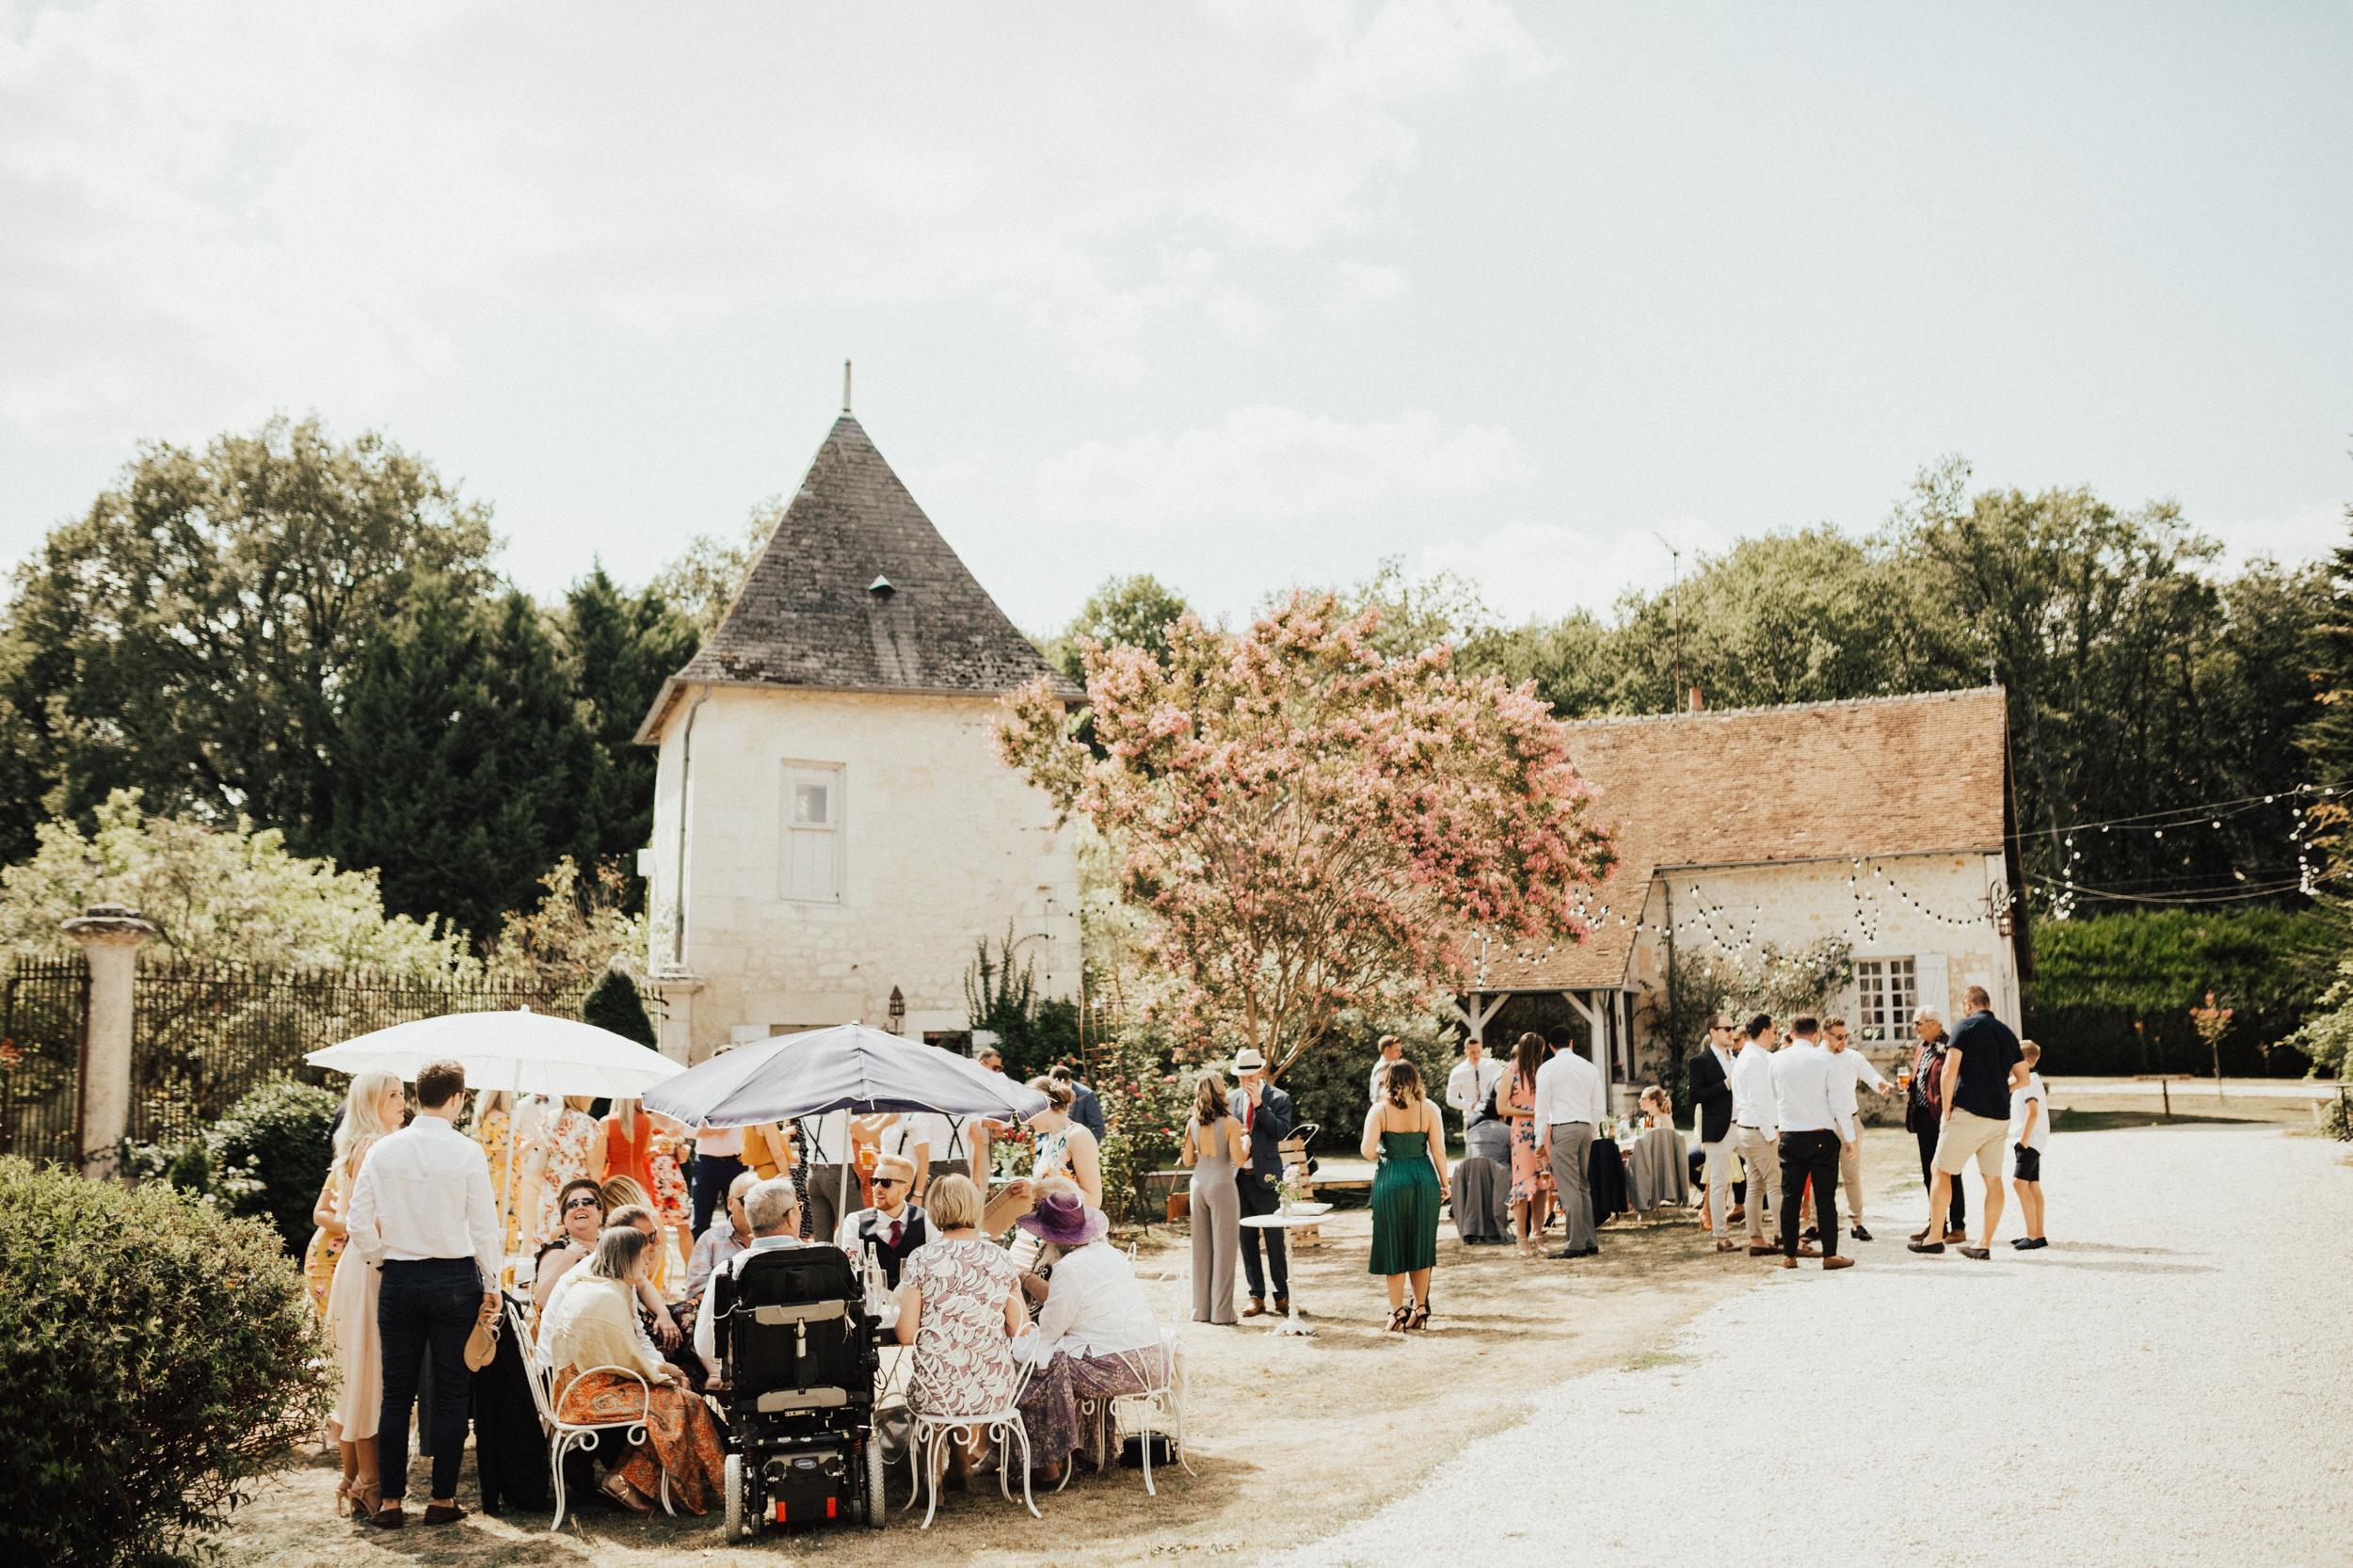 Amy-Zac-Destination-Wedding-France-Manoir-Foulquetiere-Darina-Stoda-Photography-26.jpg